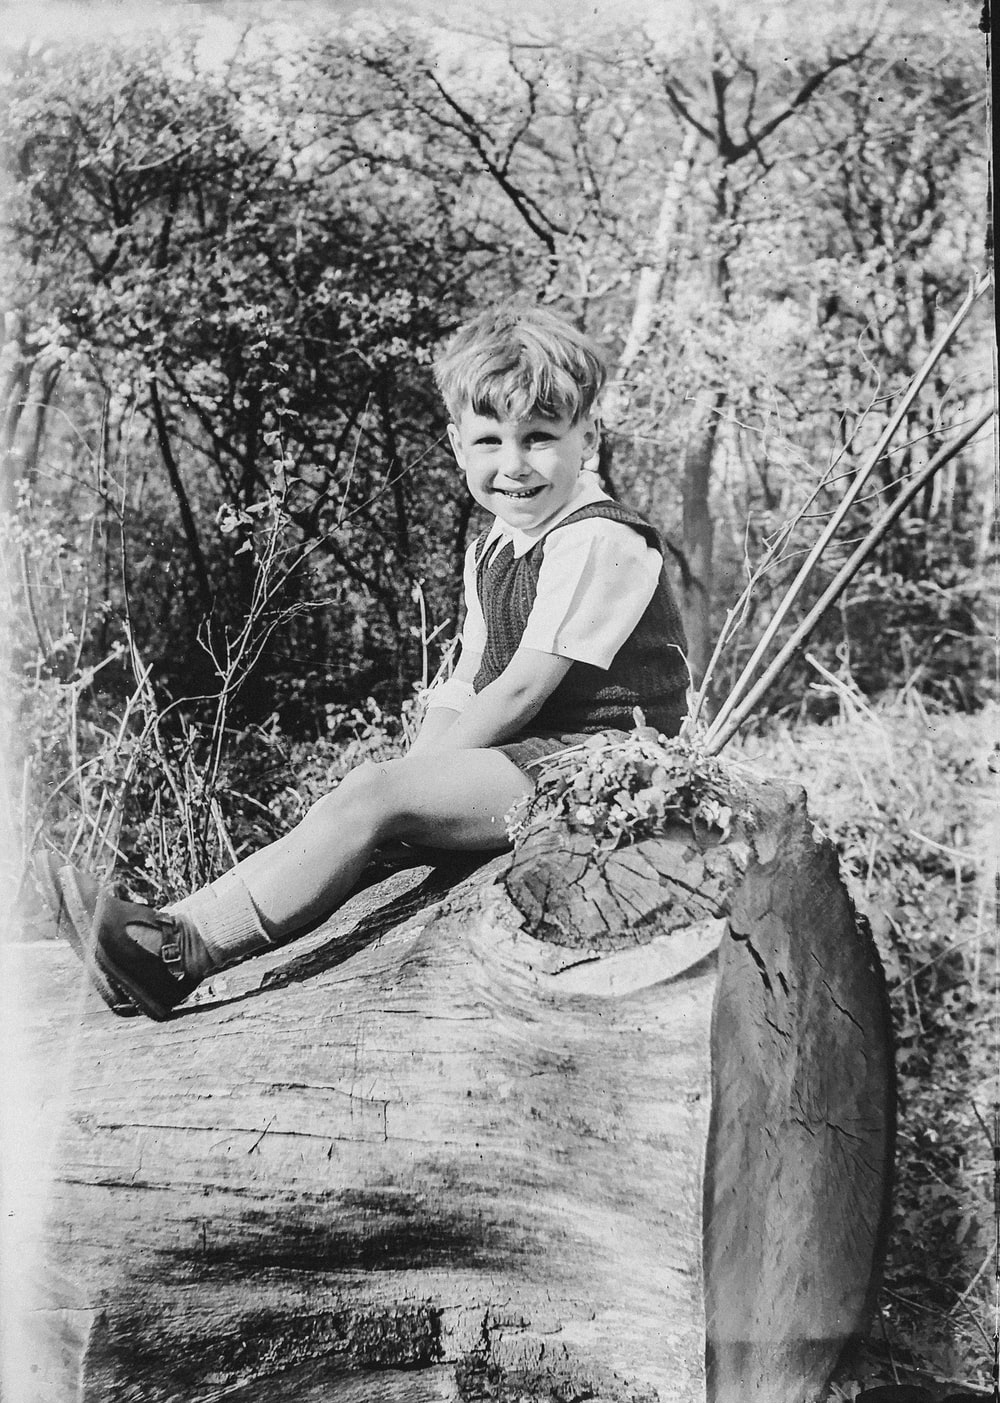 grayscale photo of boy on tree log